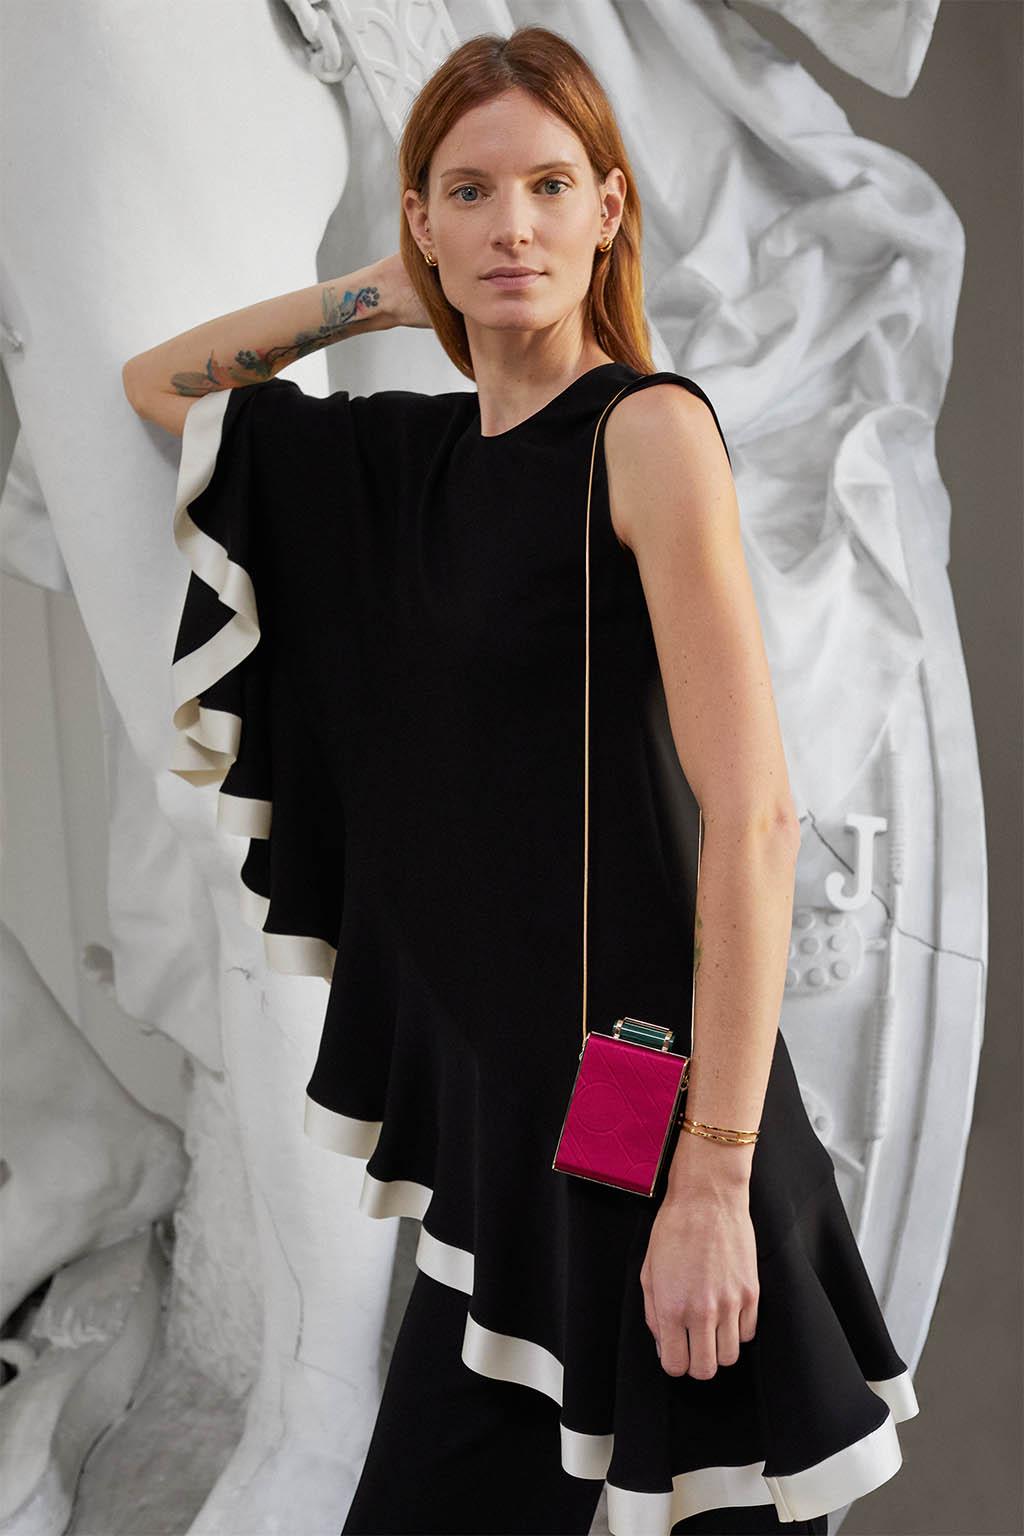 CH Carolina Herrera. New Womenswear Collection Evening. Look 05